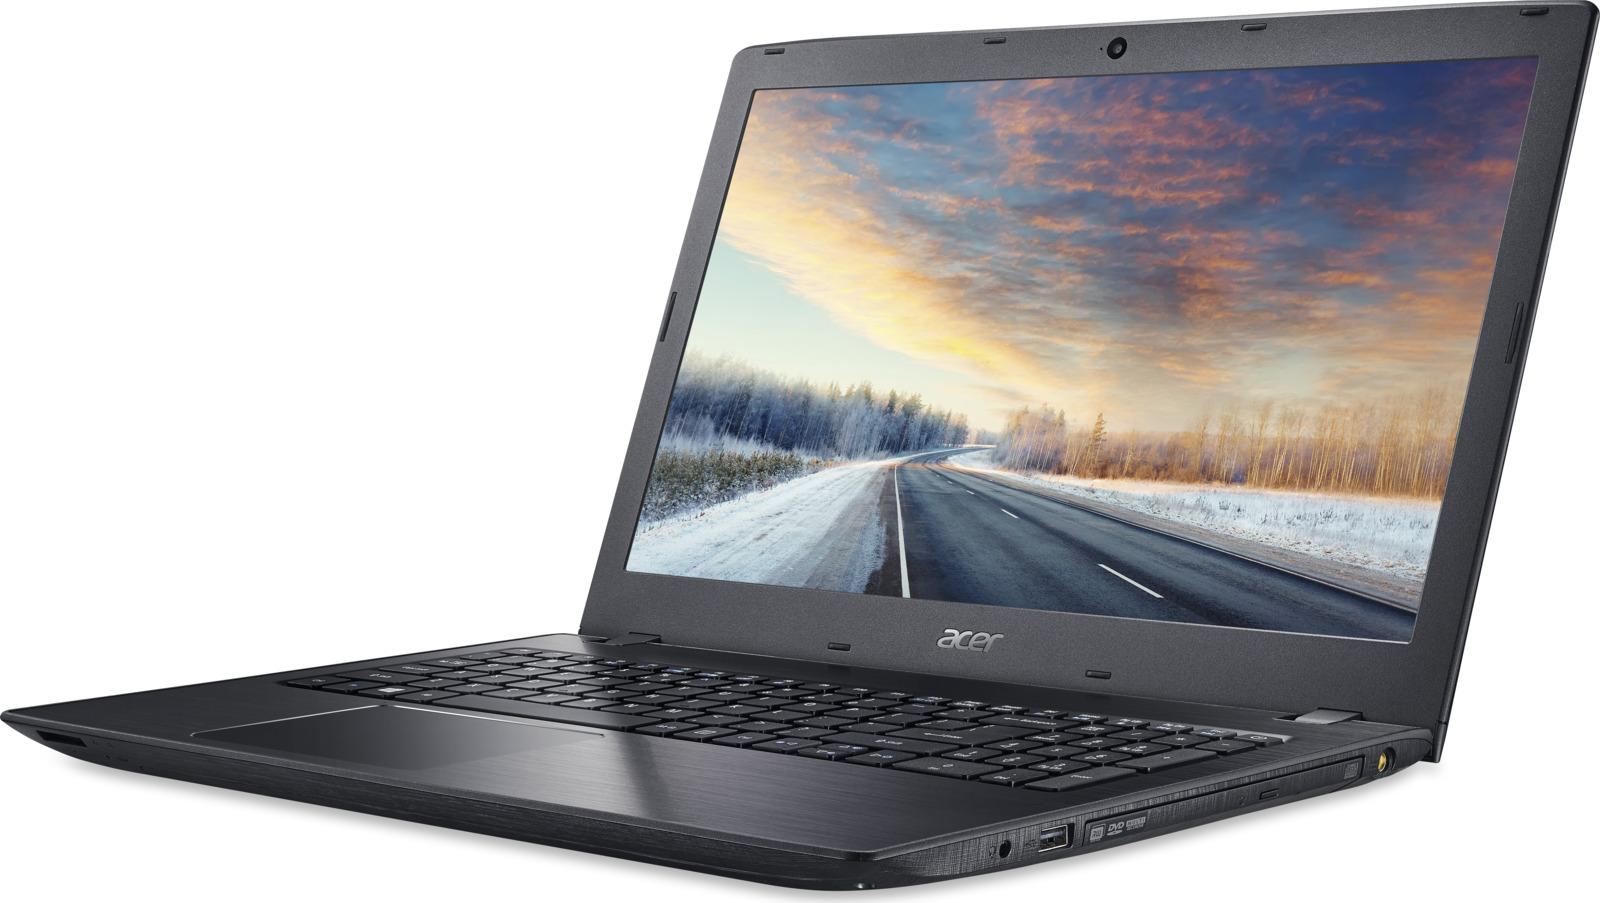 15.6 Ноутбук Acer TravelMate TMP259-G2 NX.VEPER.041 ноутбук acer travelmate tmp259 g2 m 504q nx veper 037 intel core i5 7200u 2 5ghz 4096mb 500gb intel hd graphics wi fi bluetooth cam 15 6 1366x768 linux